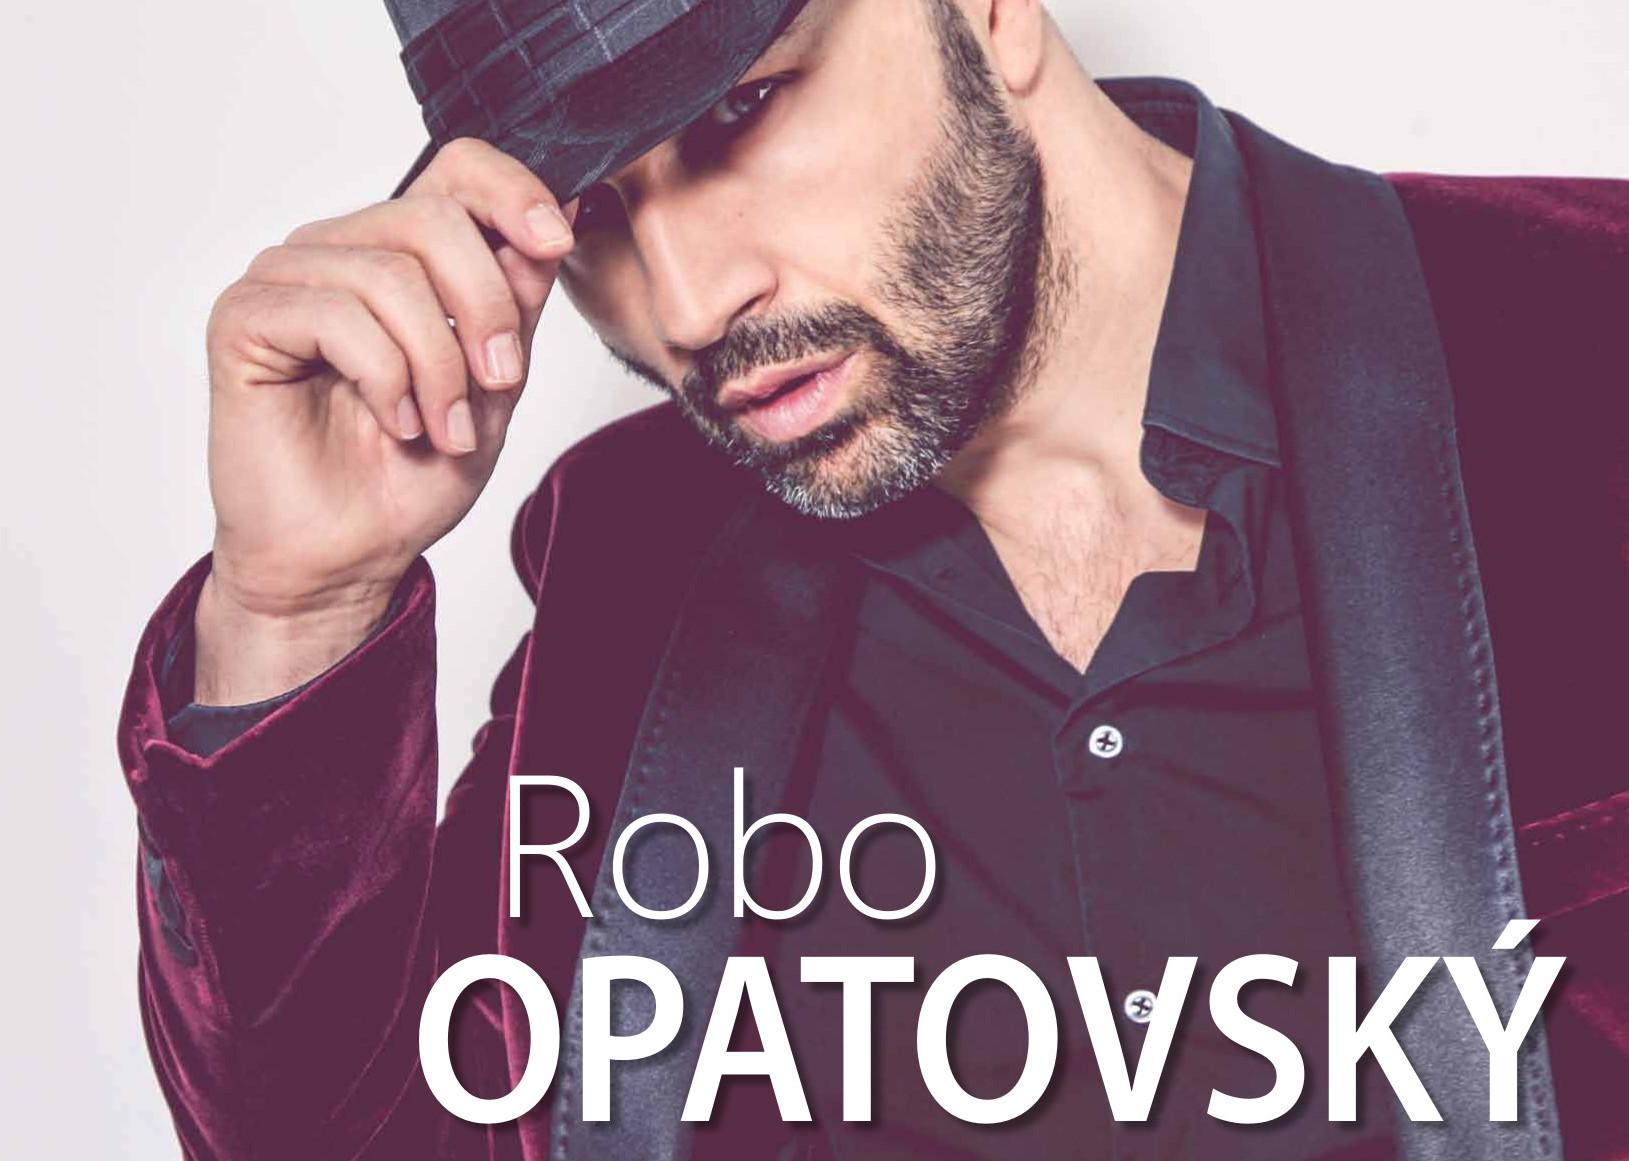 ROBO OPATOVSKÝ UNPLUGGED TOUR 2017 už čosk - Kam v meste  b443a0cde0e